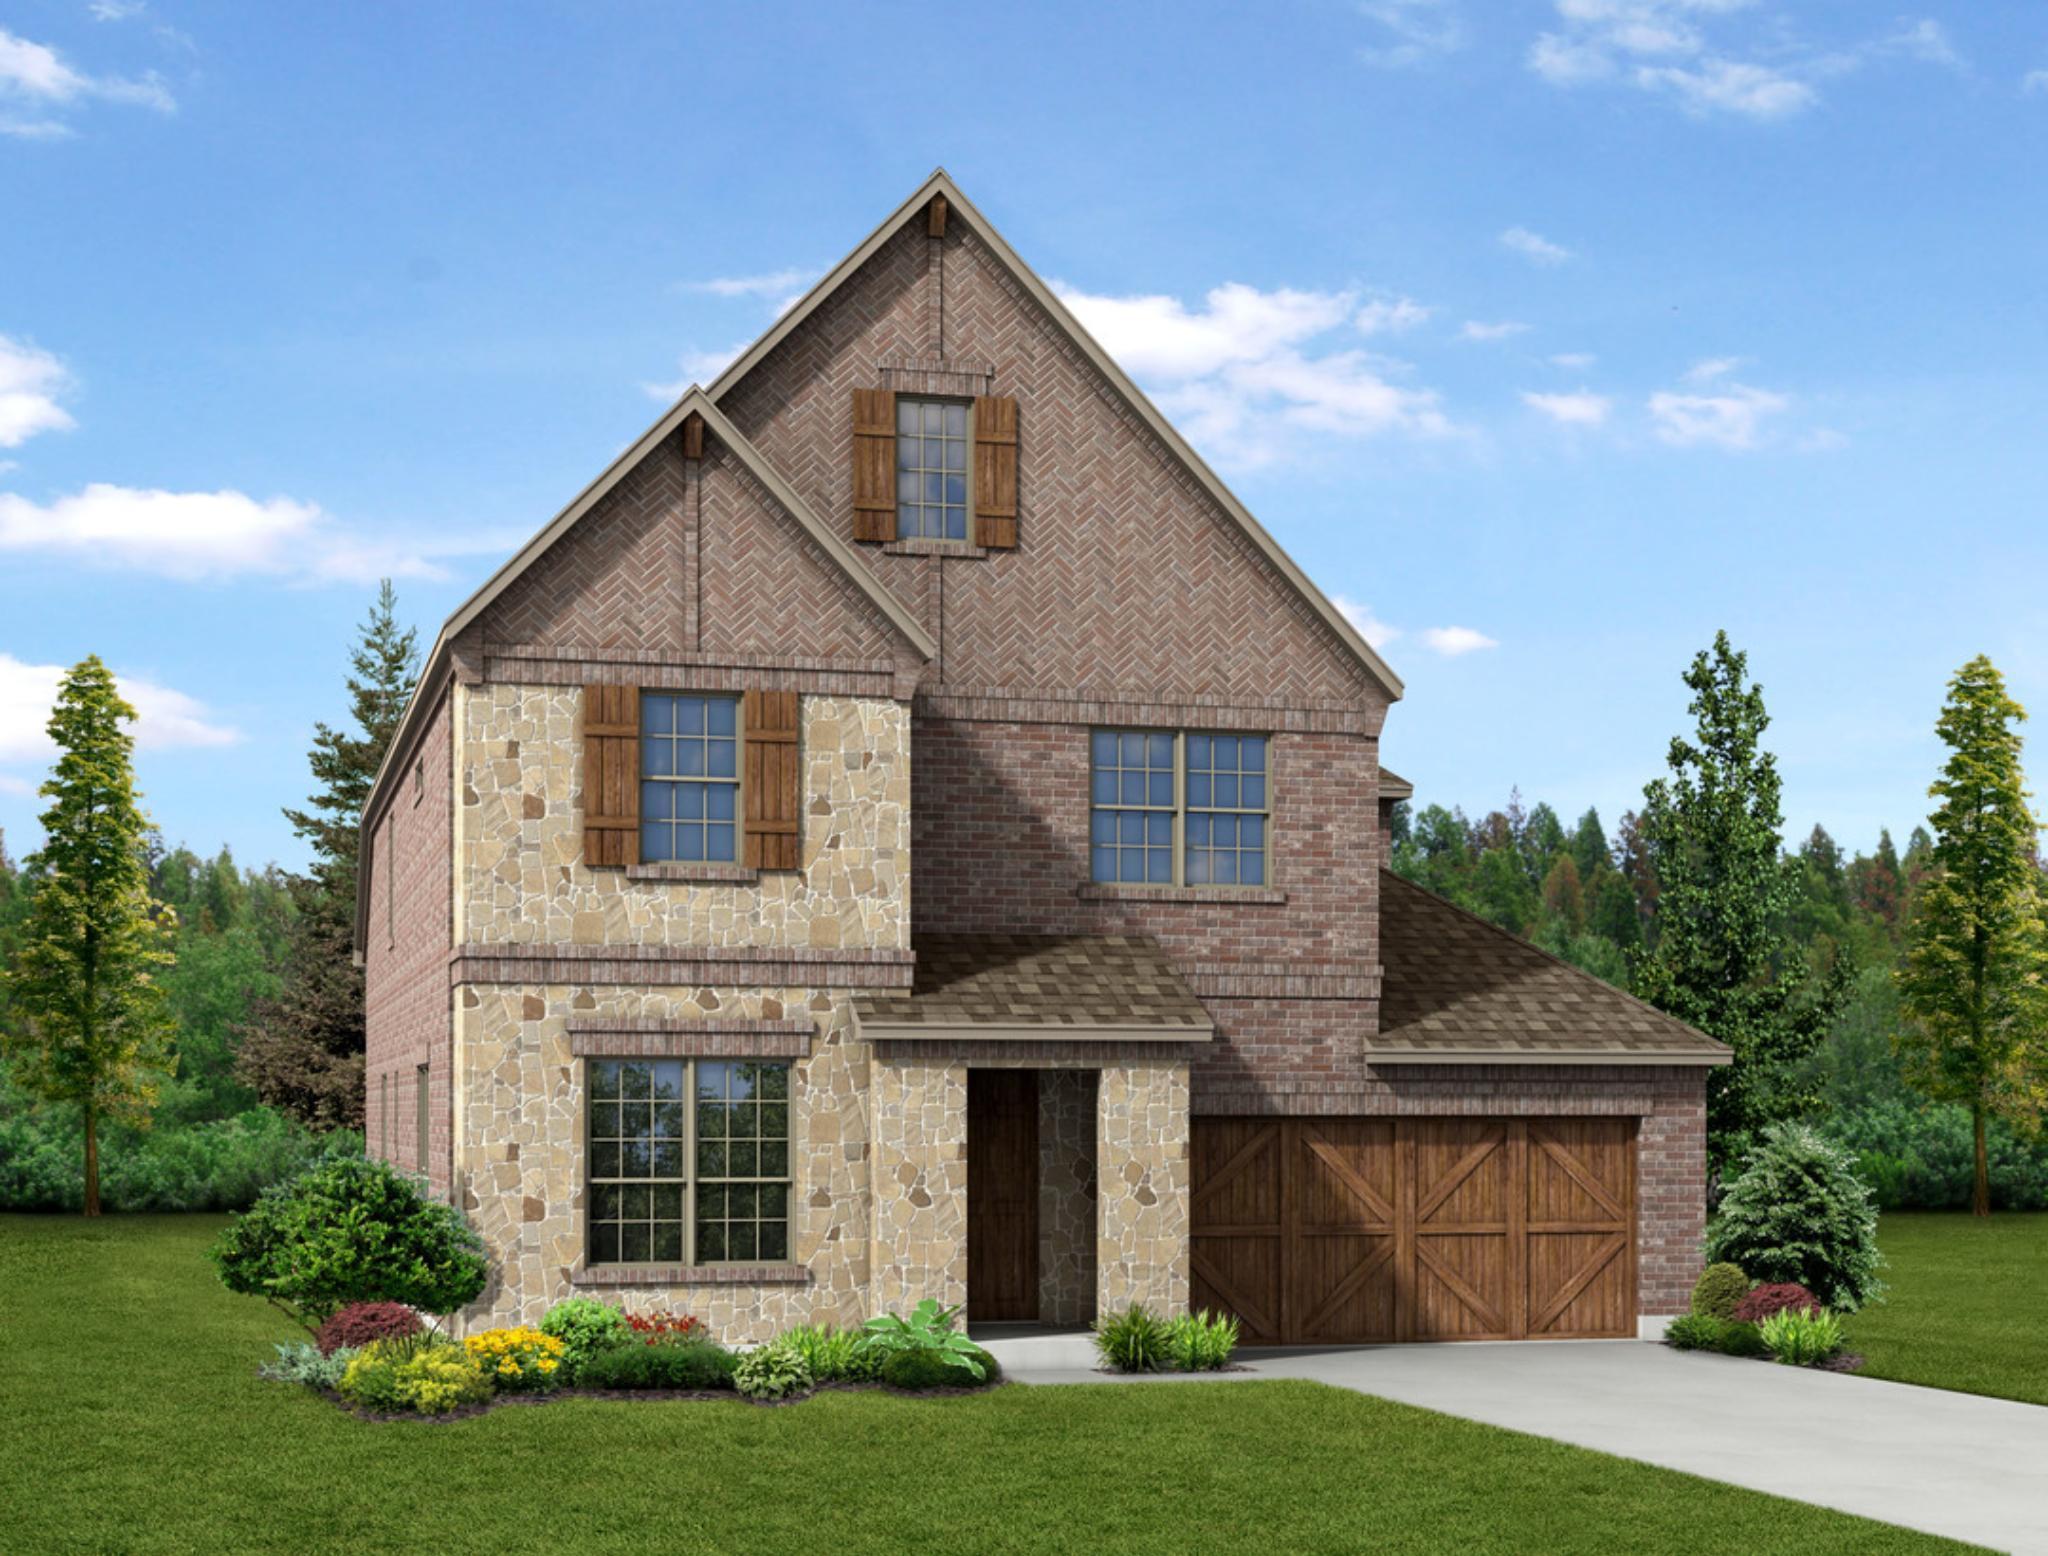 http://partners-dynamic.bdxcdn.com/Images/Homes/TrendmakerHomes/max1500_37620297-190903.jpg